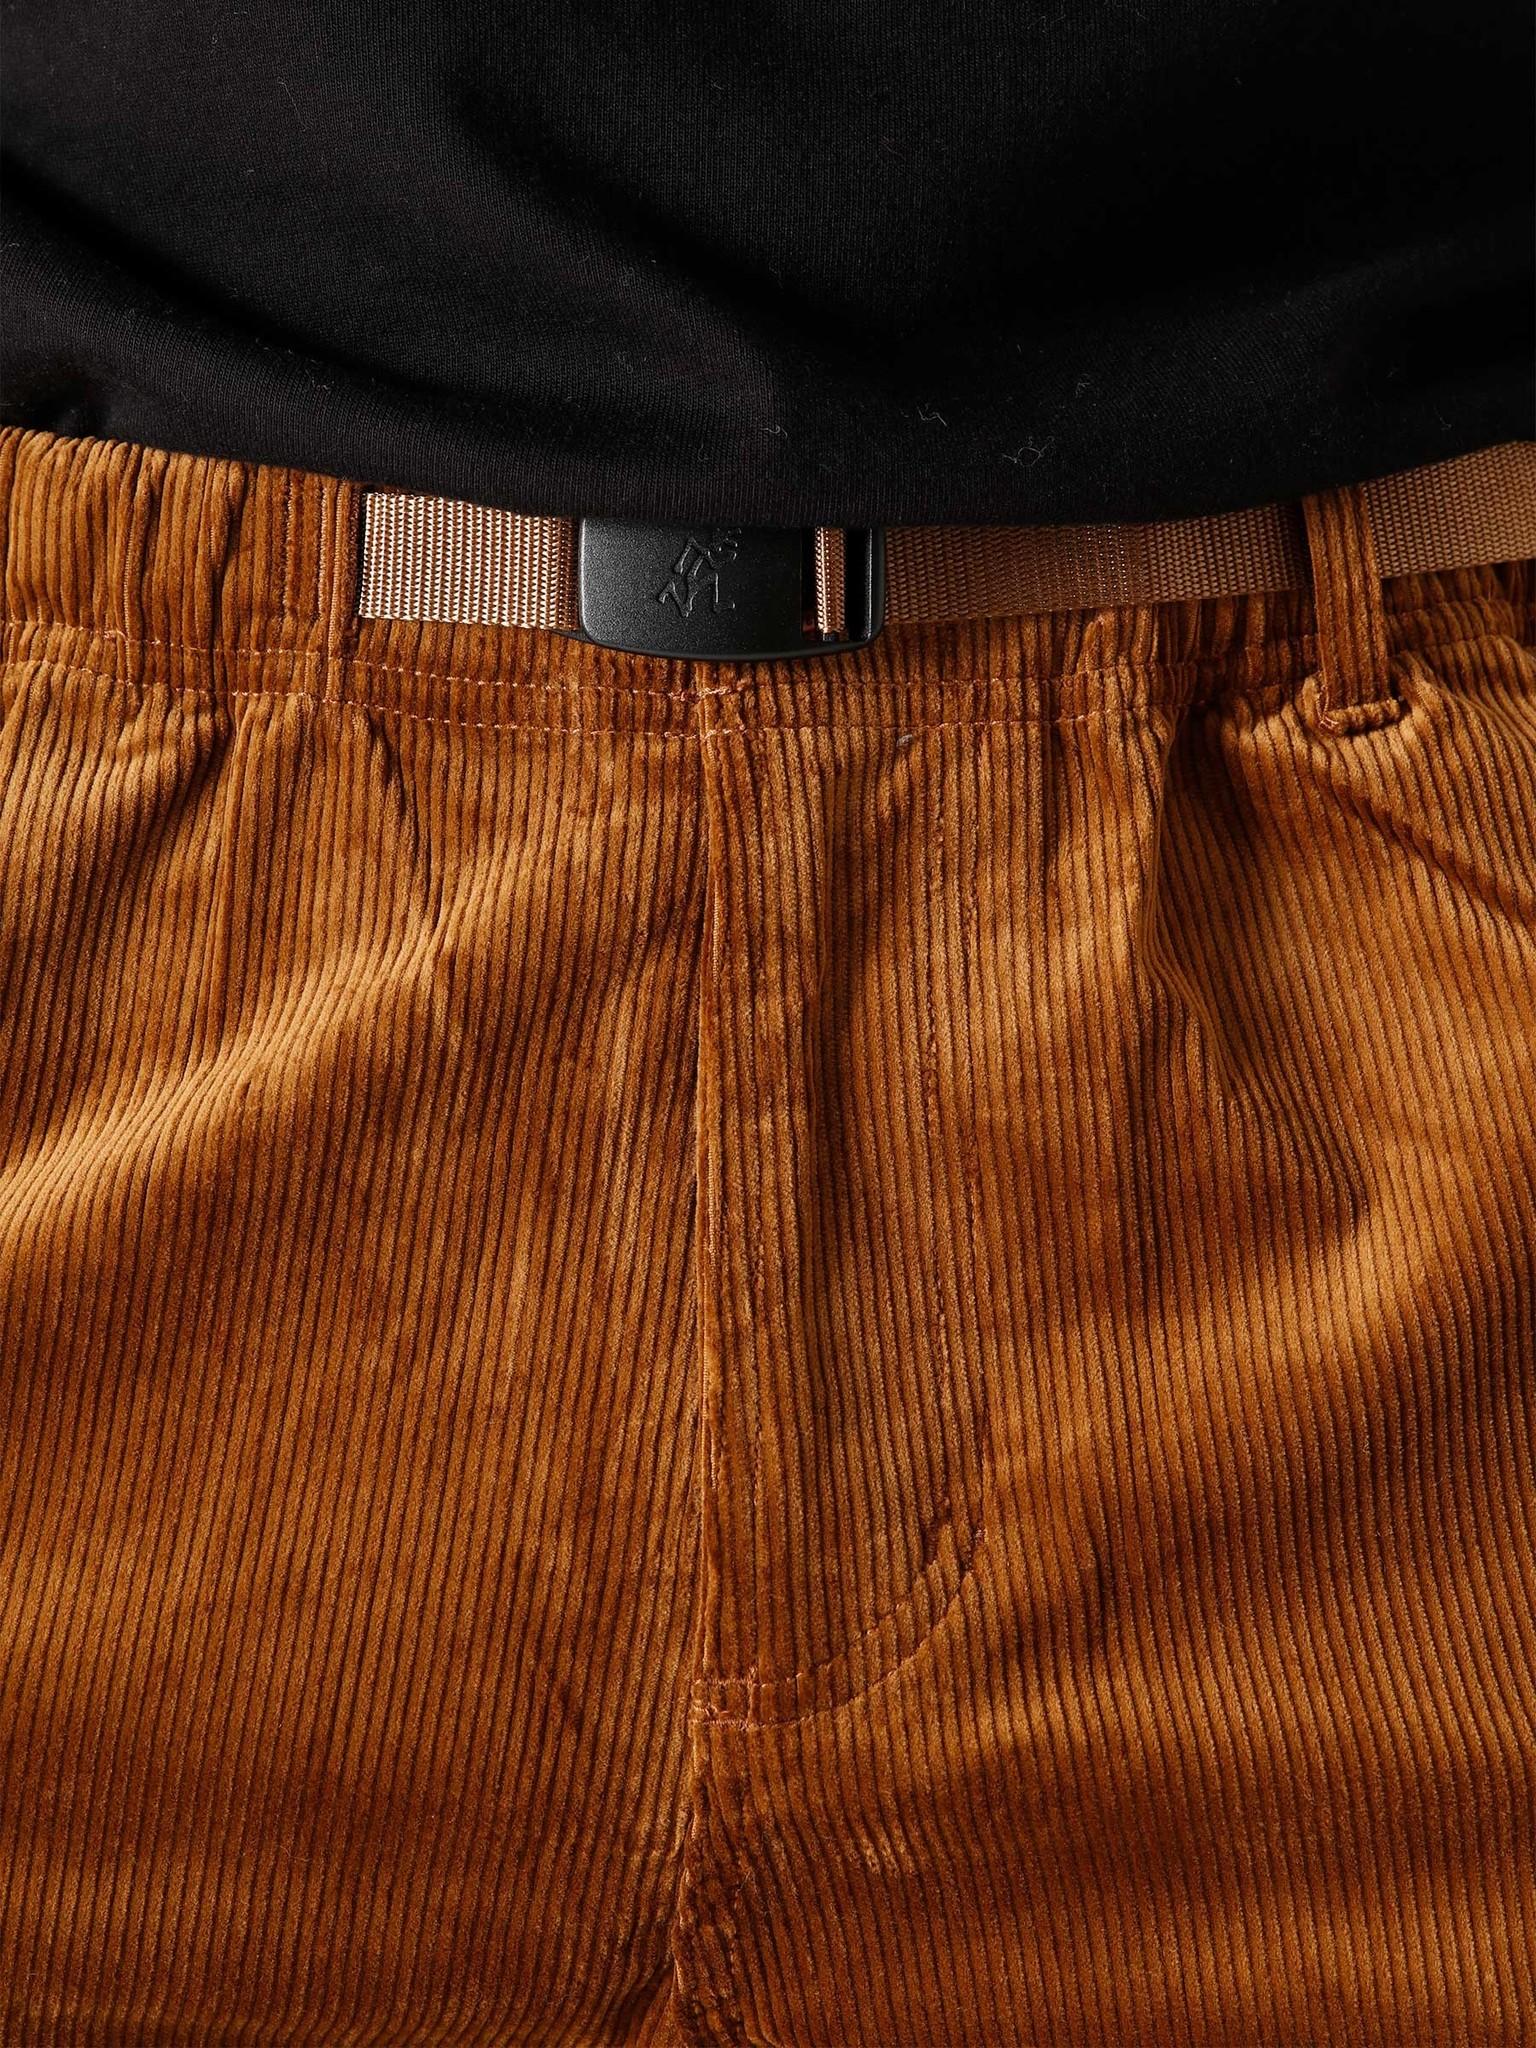 Gramicci Gramicci Corduroy Gramicci Pants Camel GMP-20F018